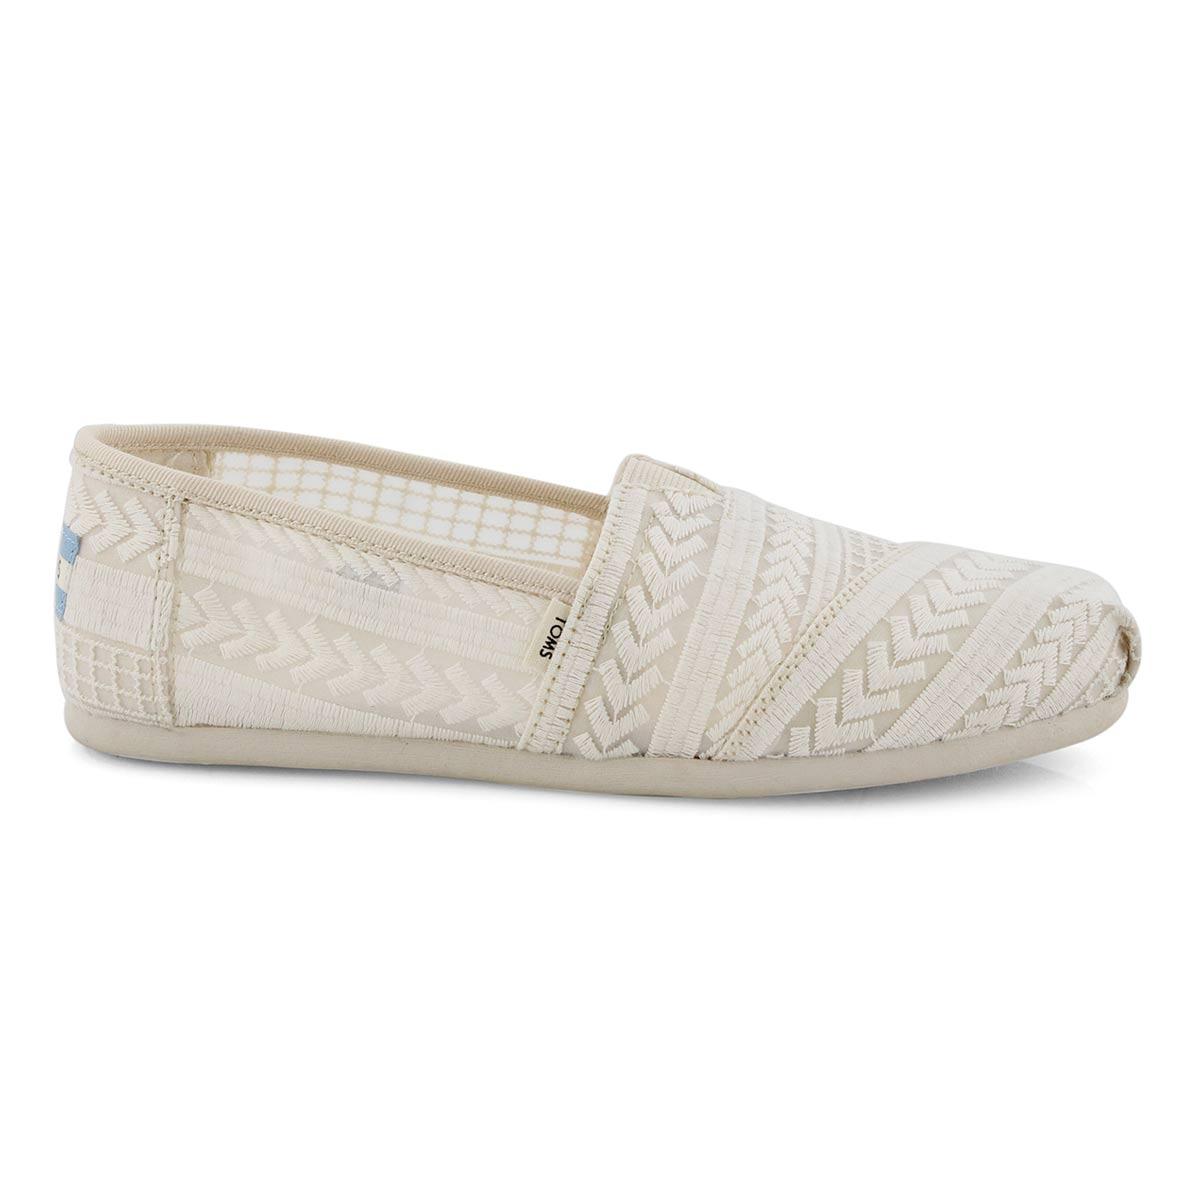 Lds Alpergata natural casual loafer